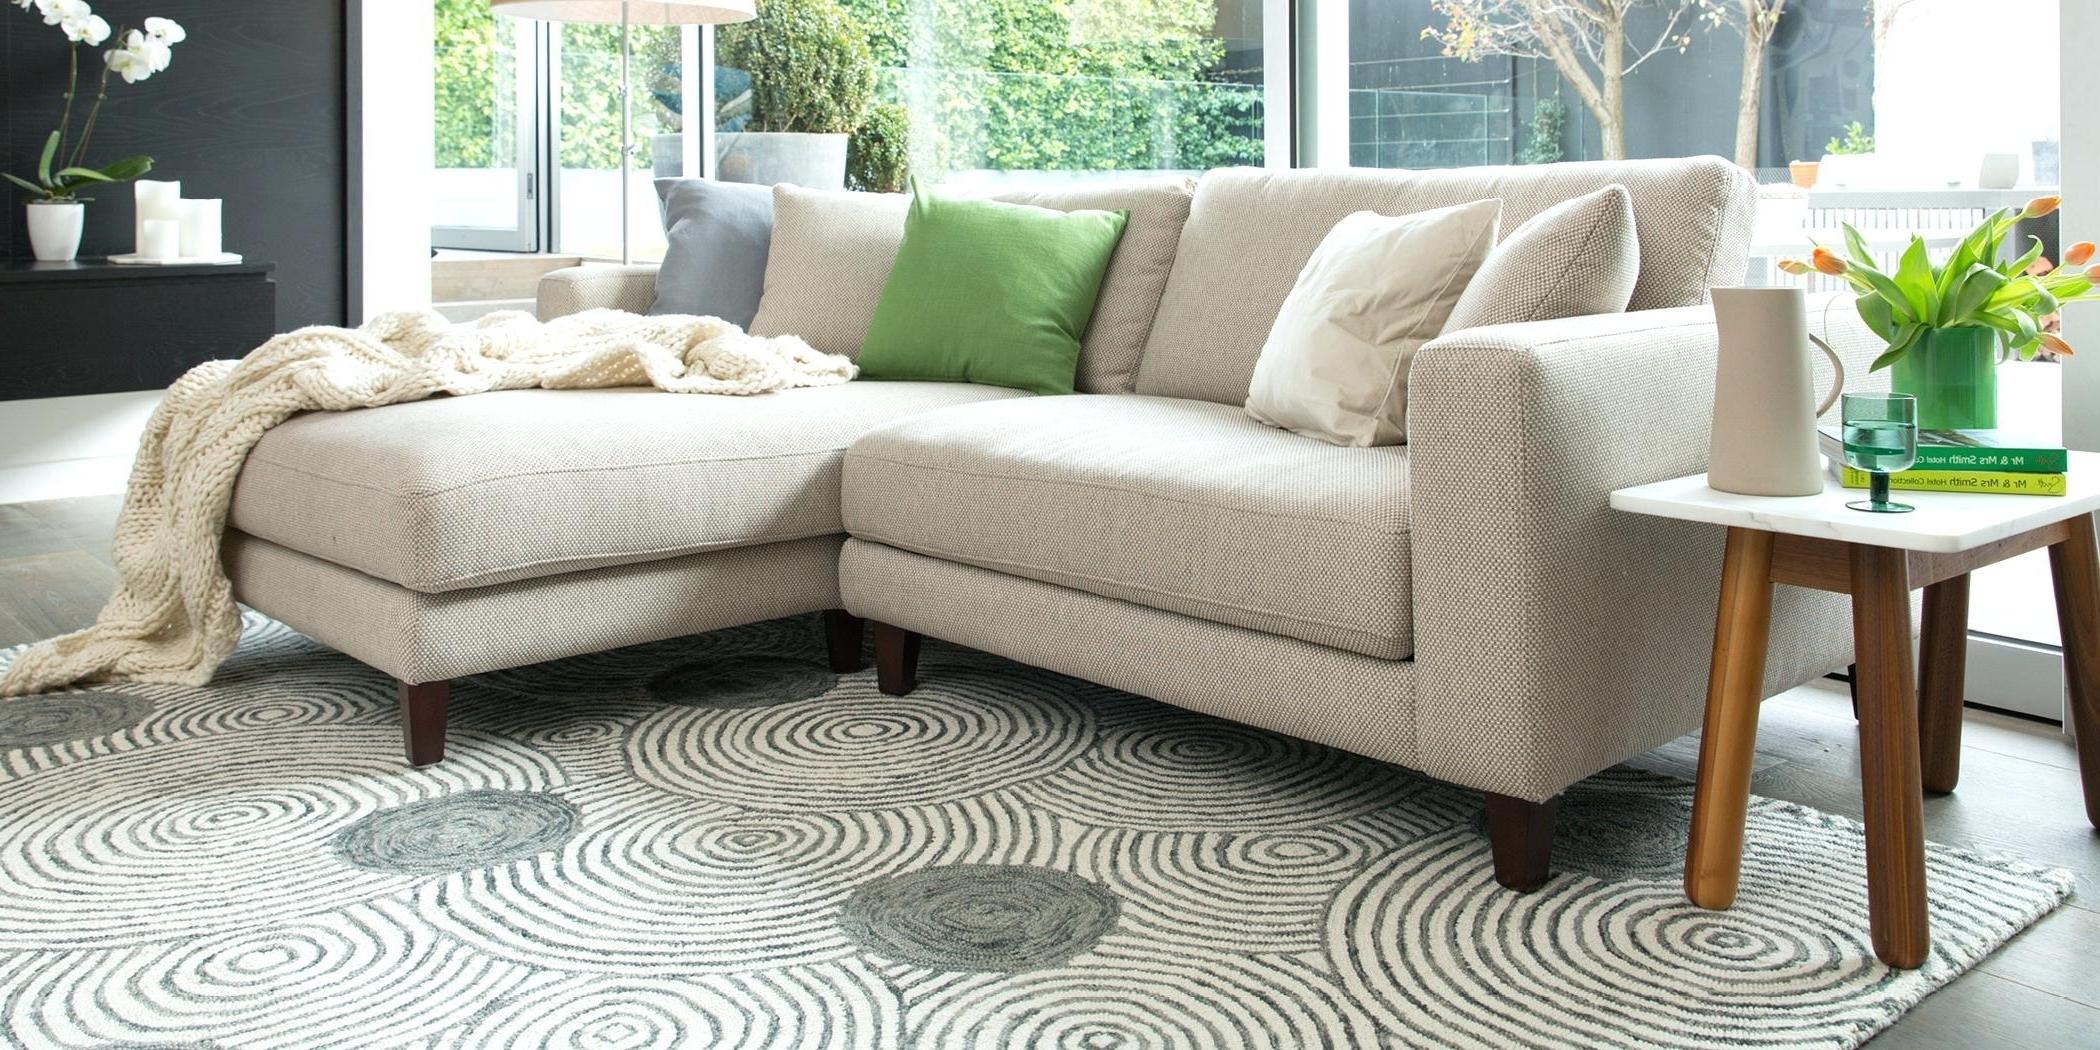 Trendy Gallery Corner Snuggle Sofa – Mediasupload Inside Snuggle Sofas (View 11 of 20)